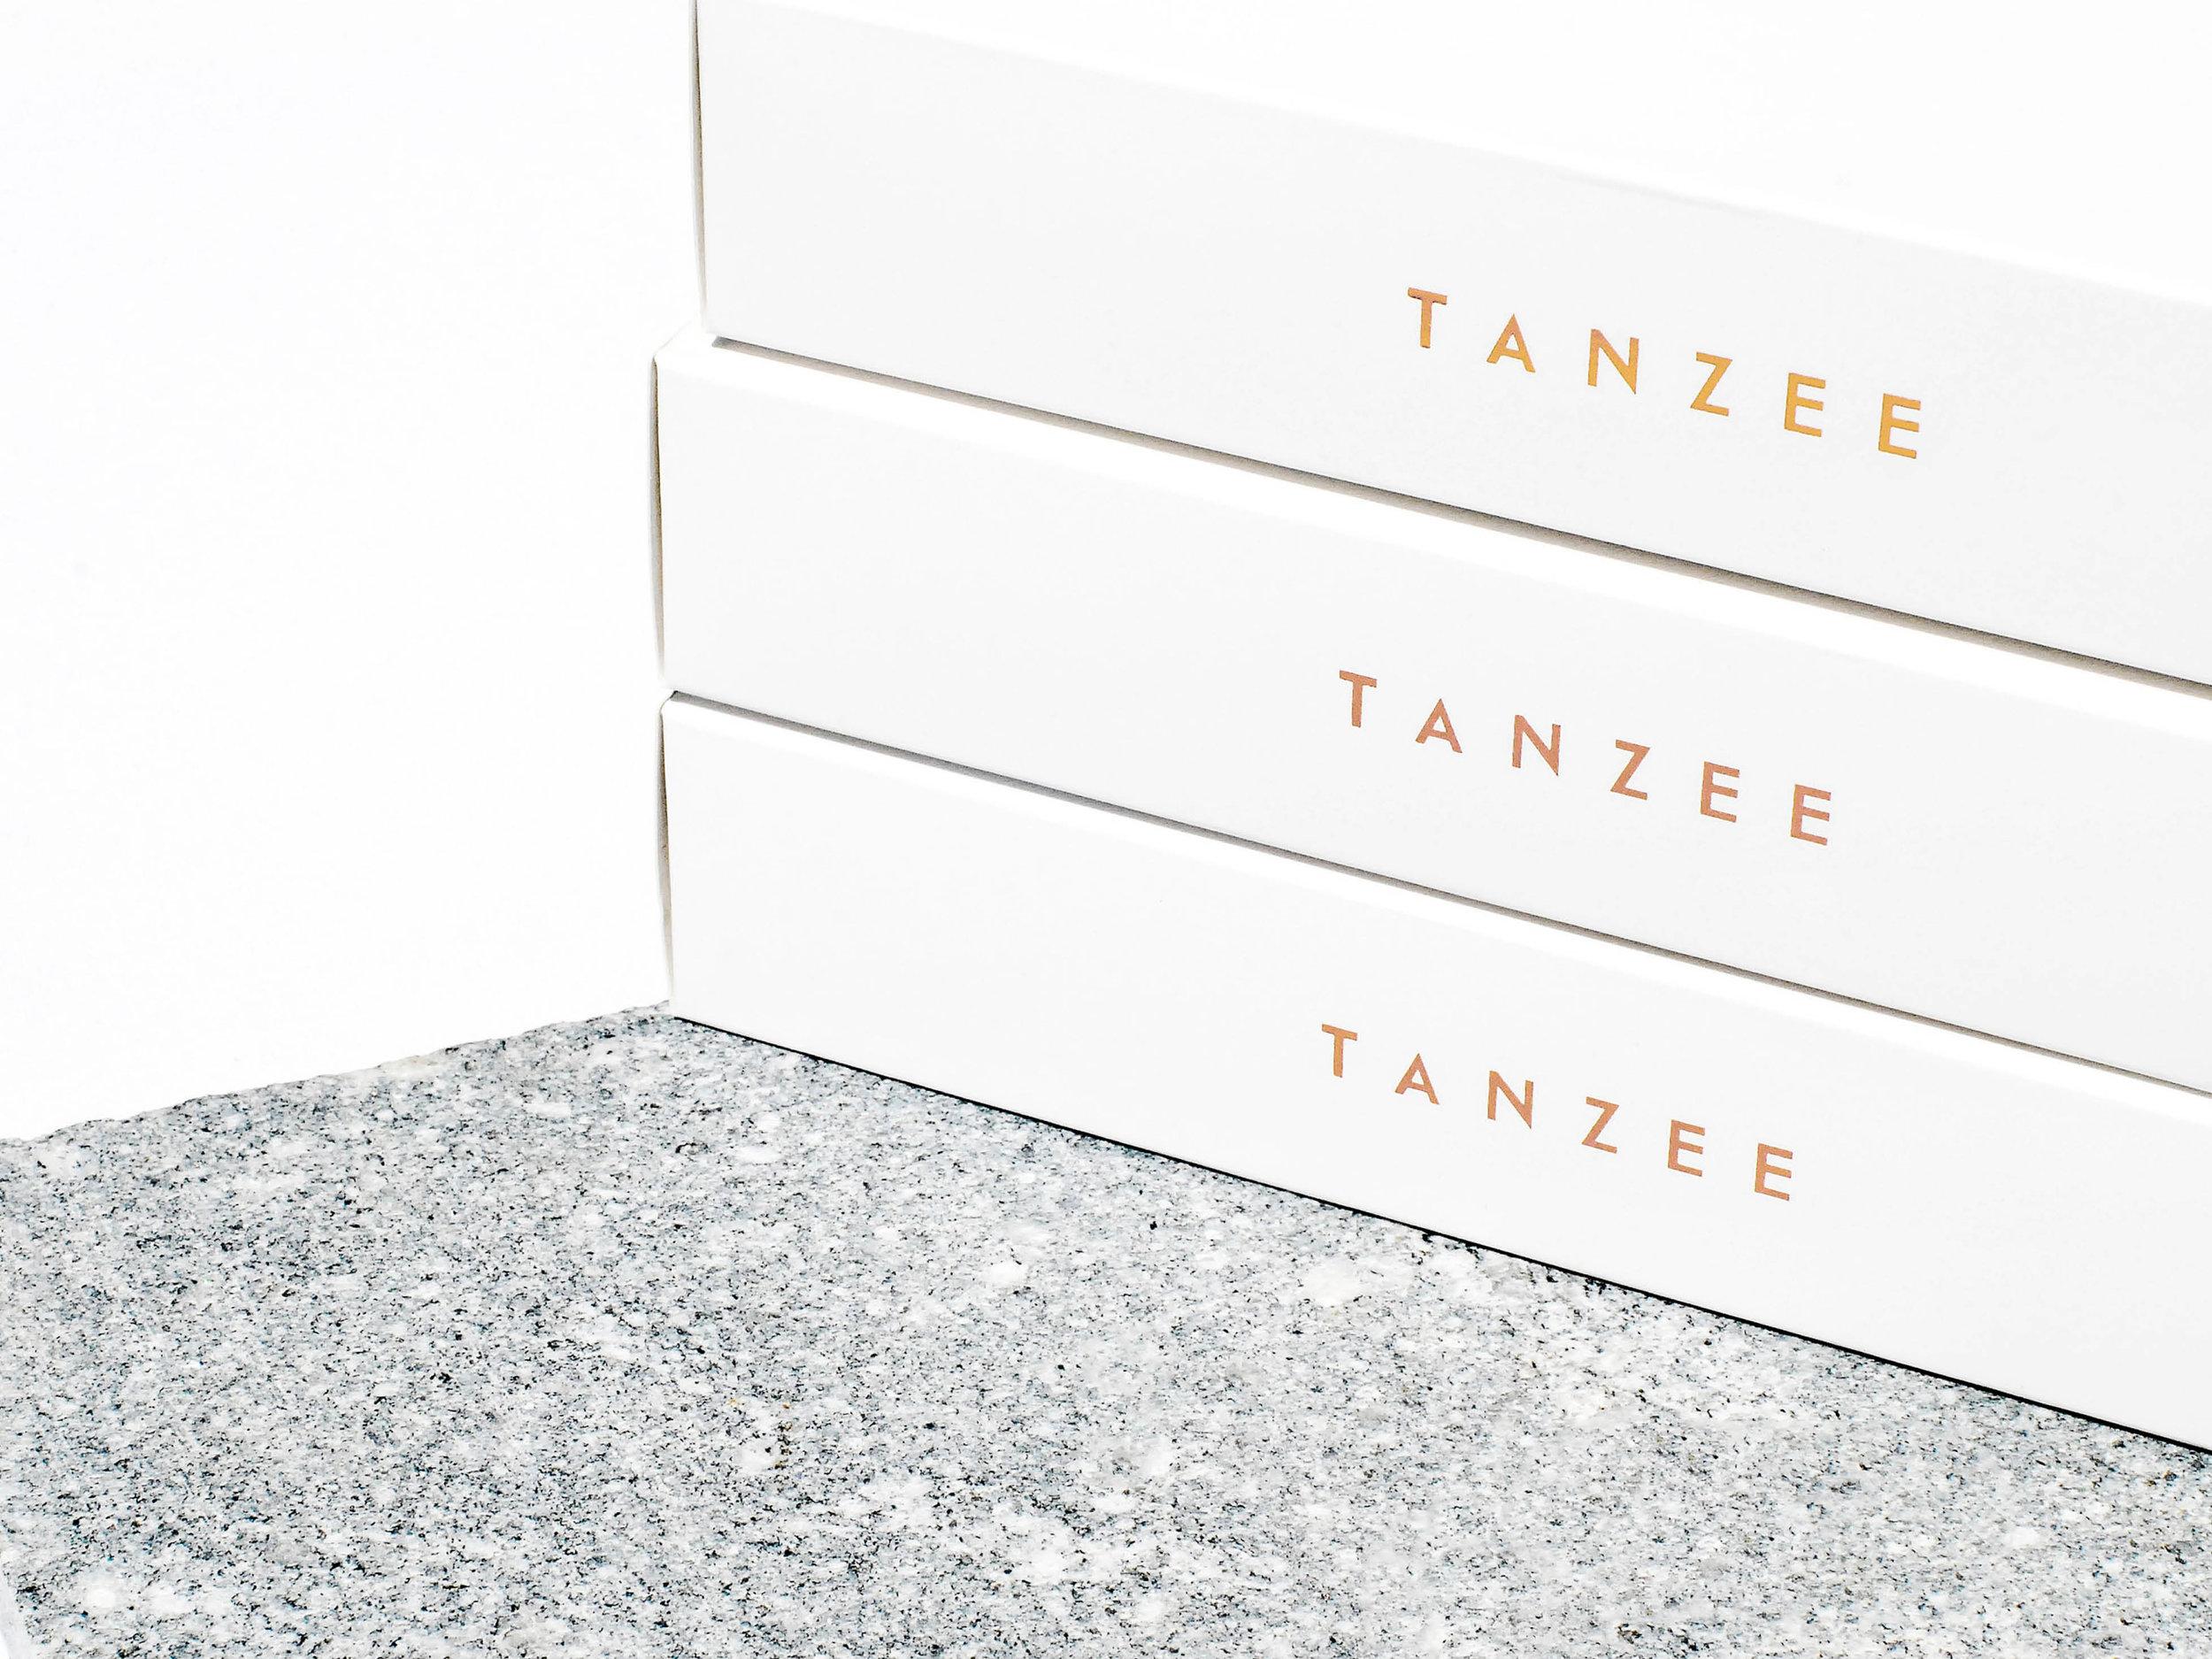 Tanzee_Body_Packaging_Branding_Design_5